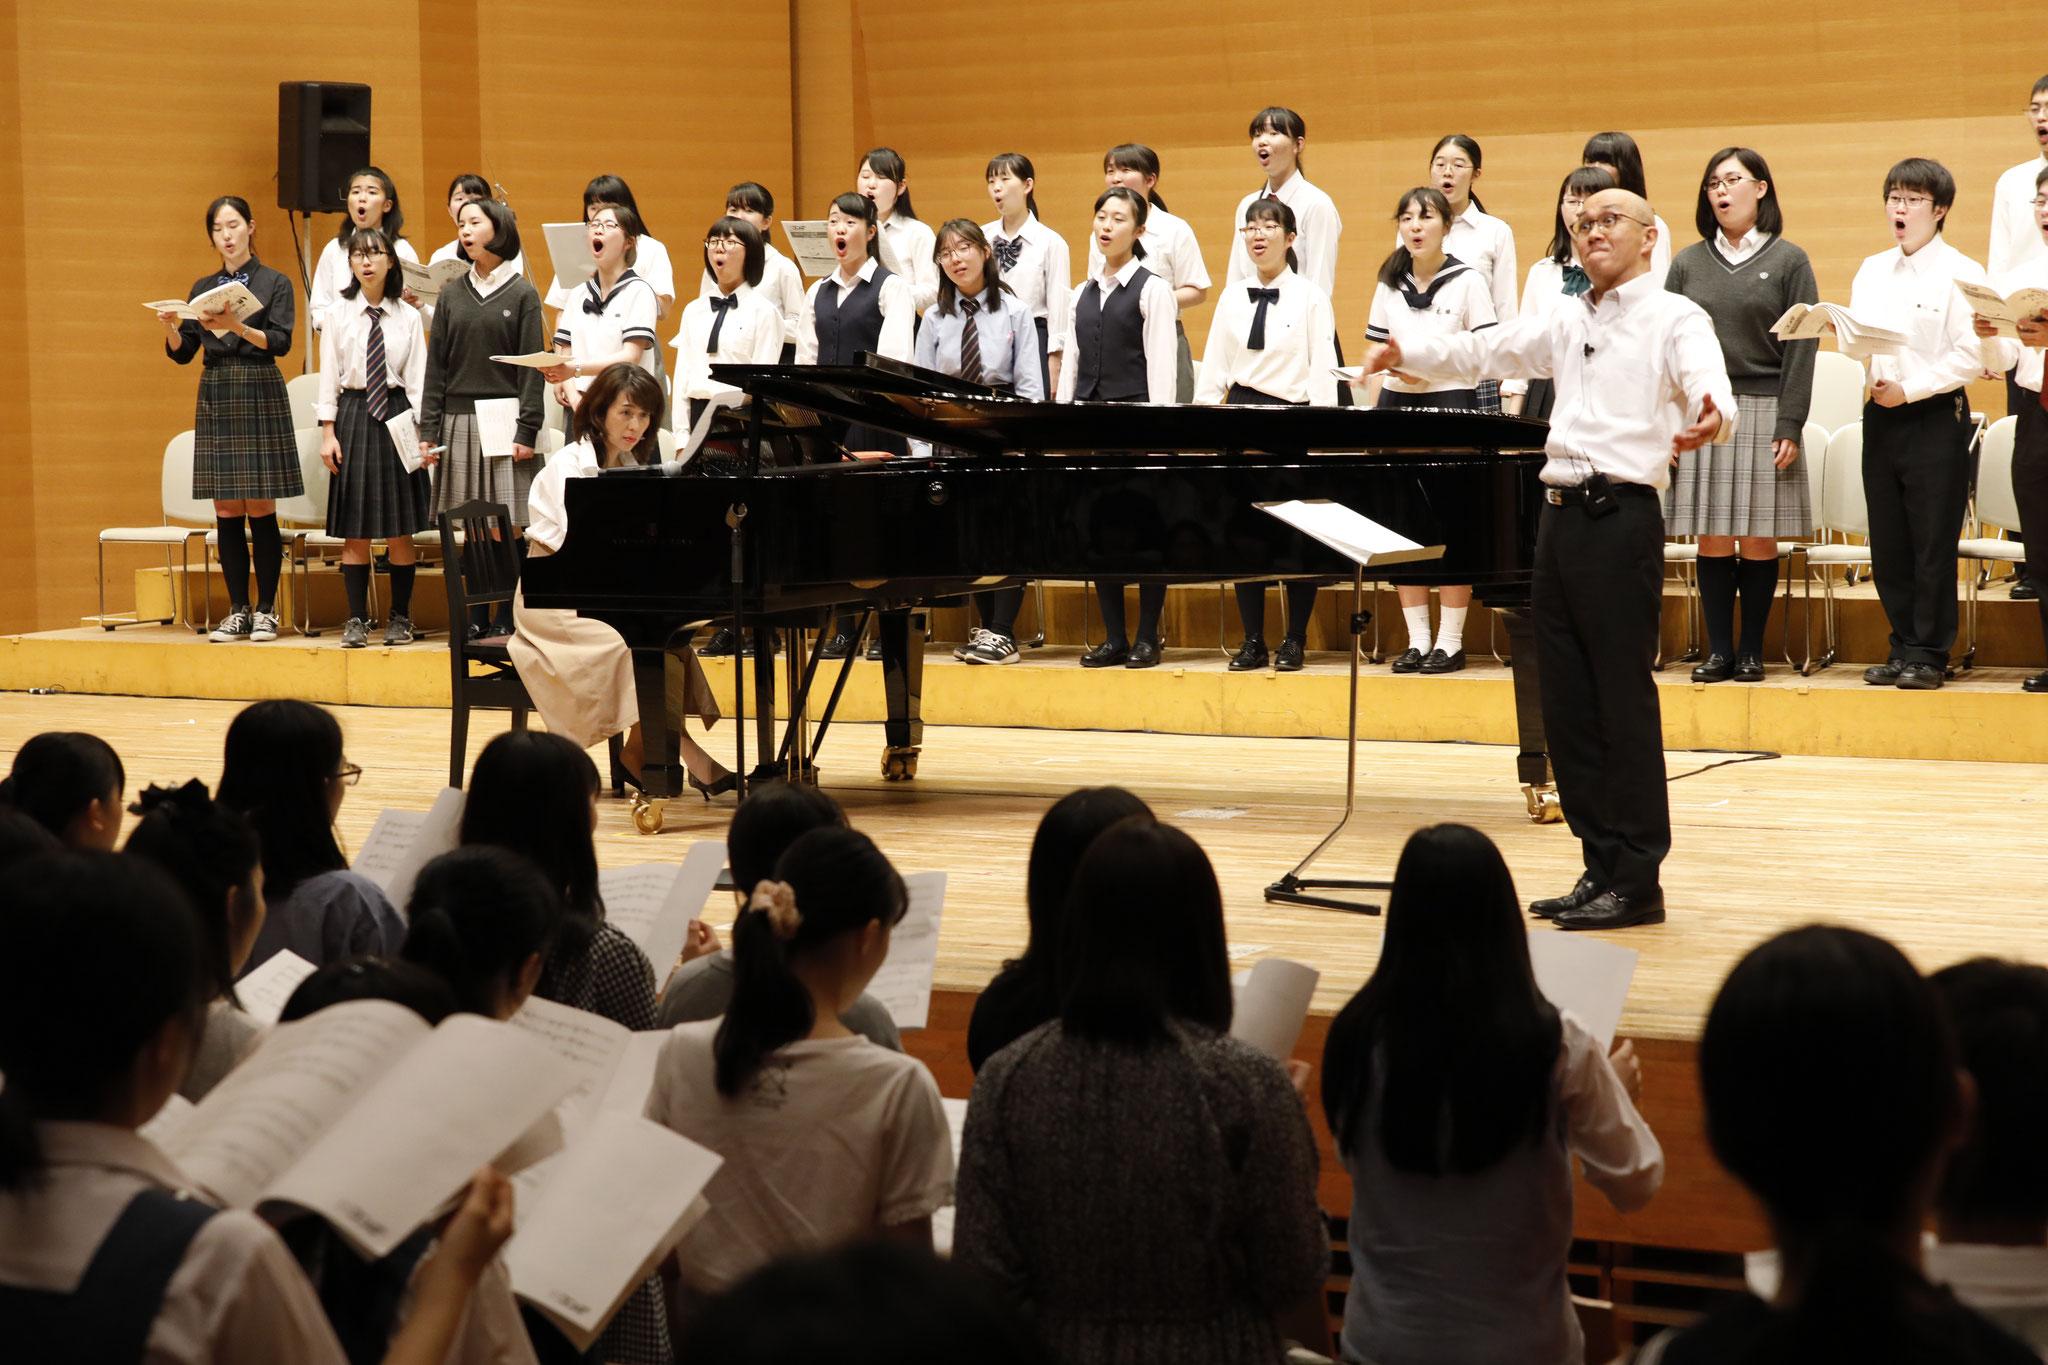 NHK全国学校音楽コンクール課題曲講習会(高等学校) 講師:雨森文也・横山潤子